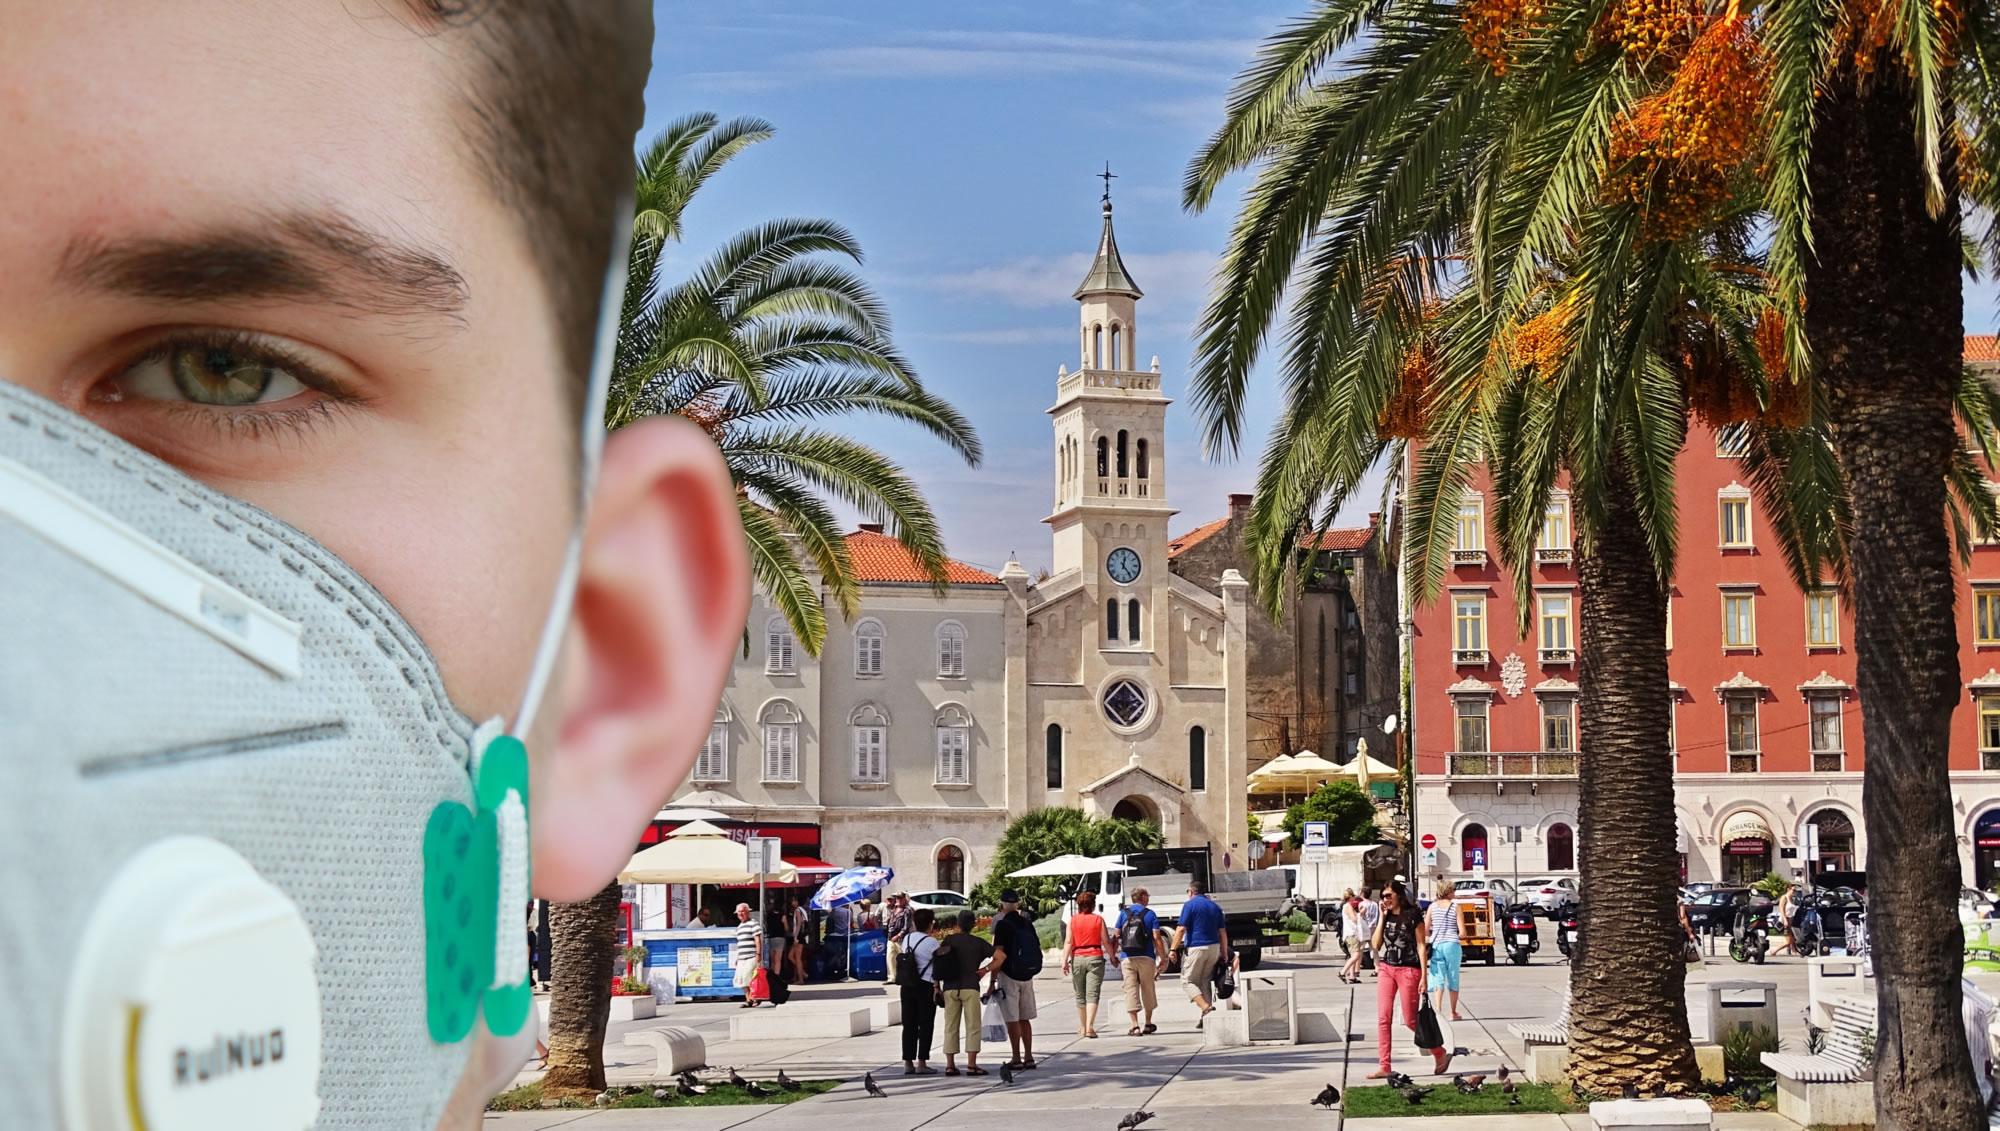 Coronavirus In Croatia How To Visit Split And Dubrovnik During Covid 19 Split Croatia Travel Guide